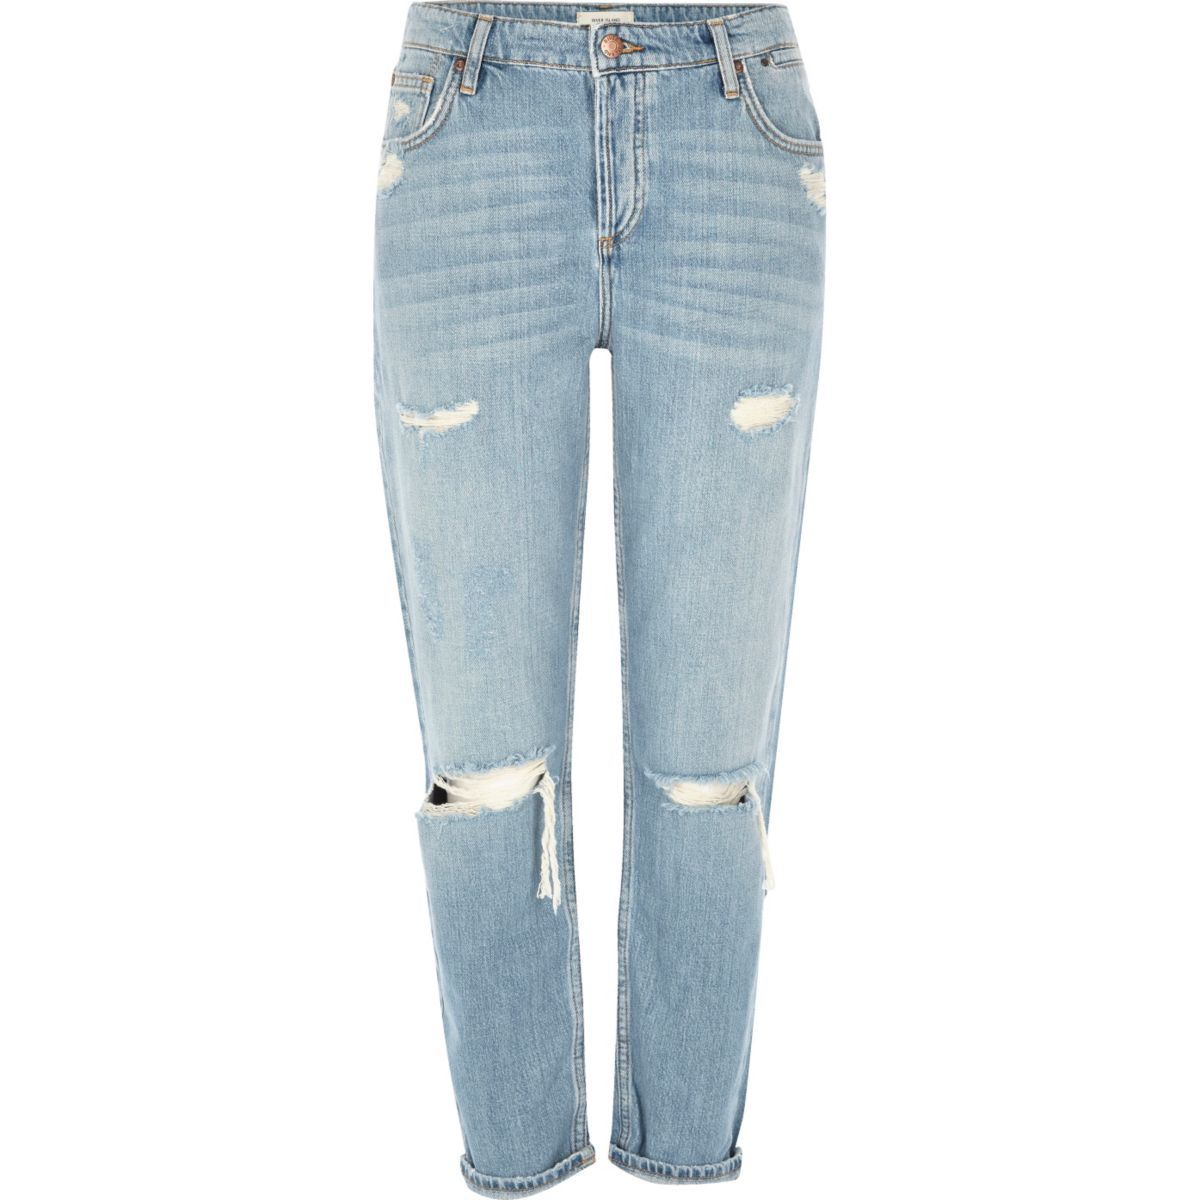 Light blue ripped Ashley boyfriend jeans